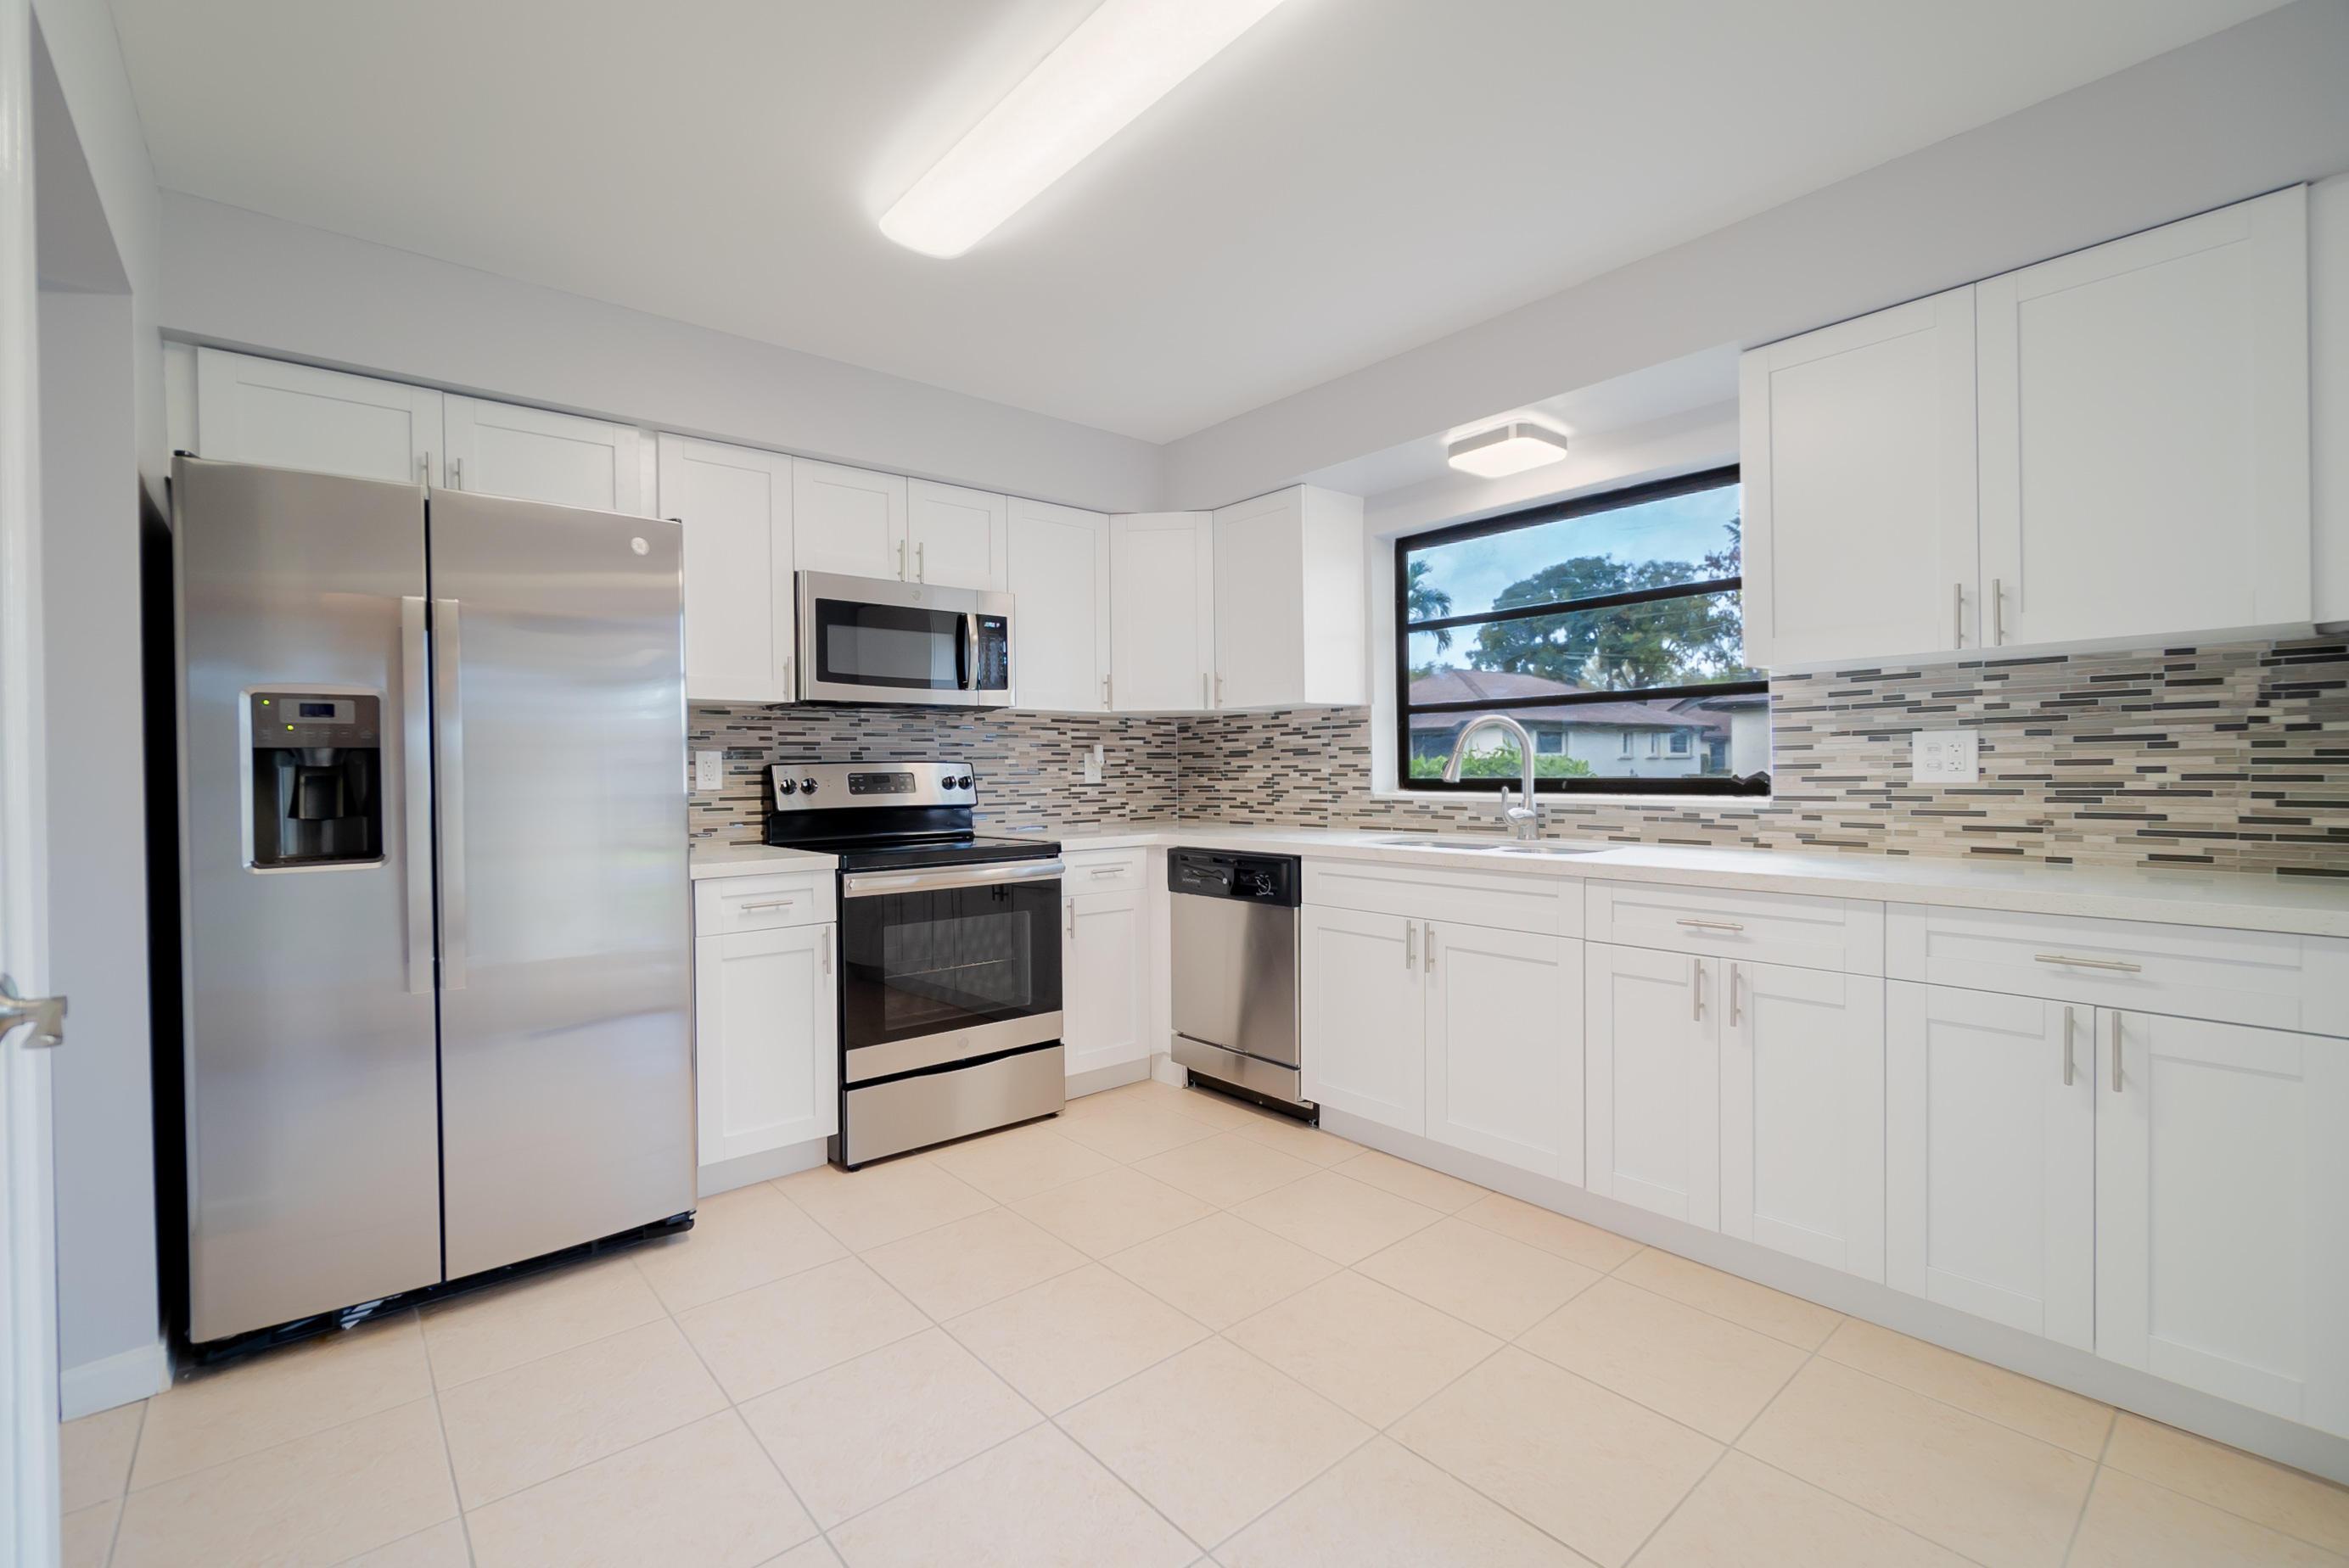 4740 Storkwood Lane B, Boynton Beach, FL 33436